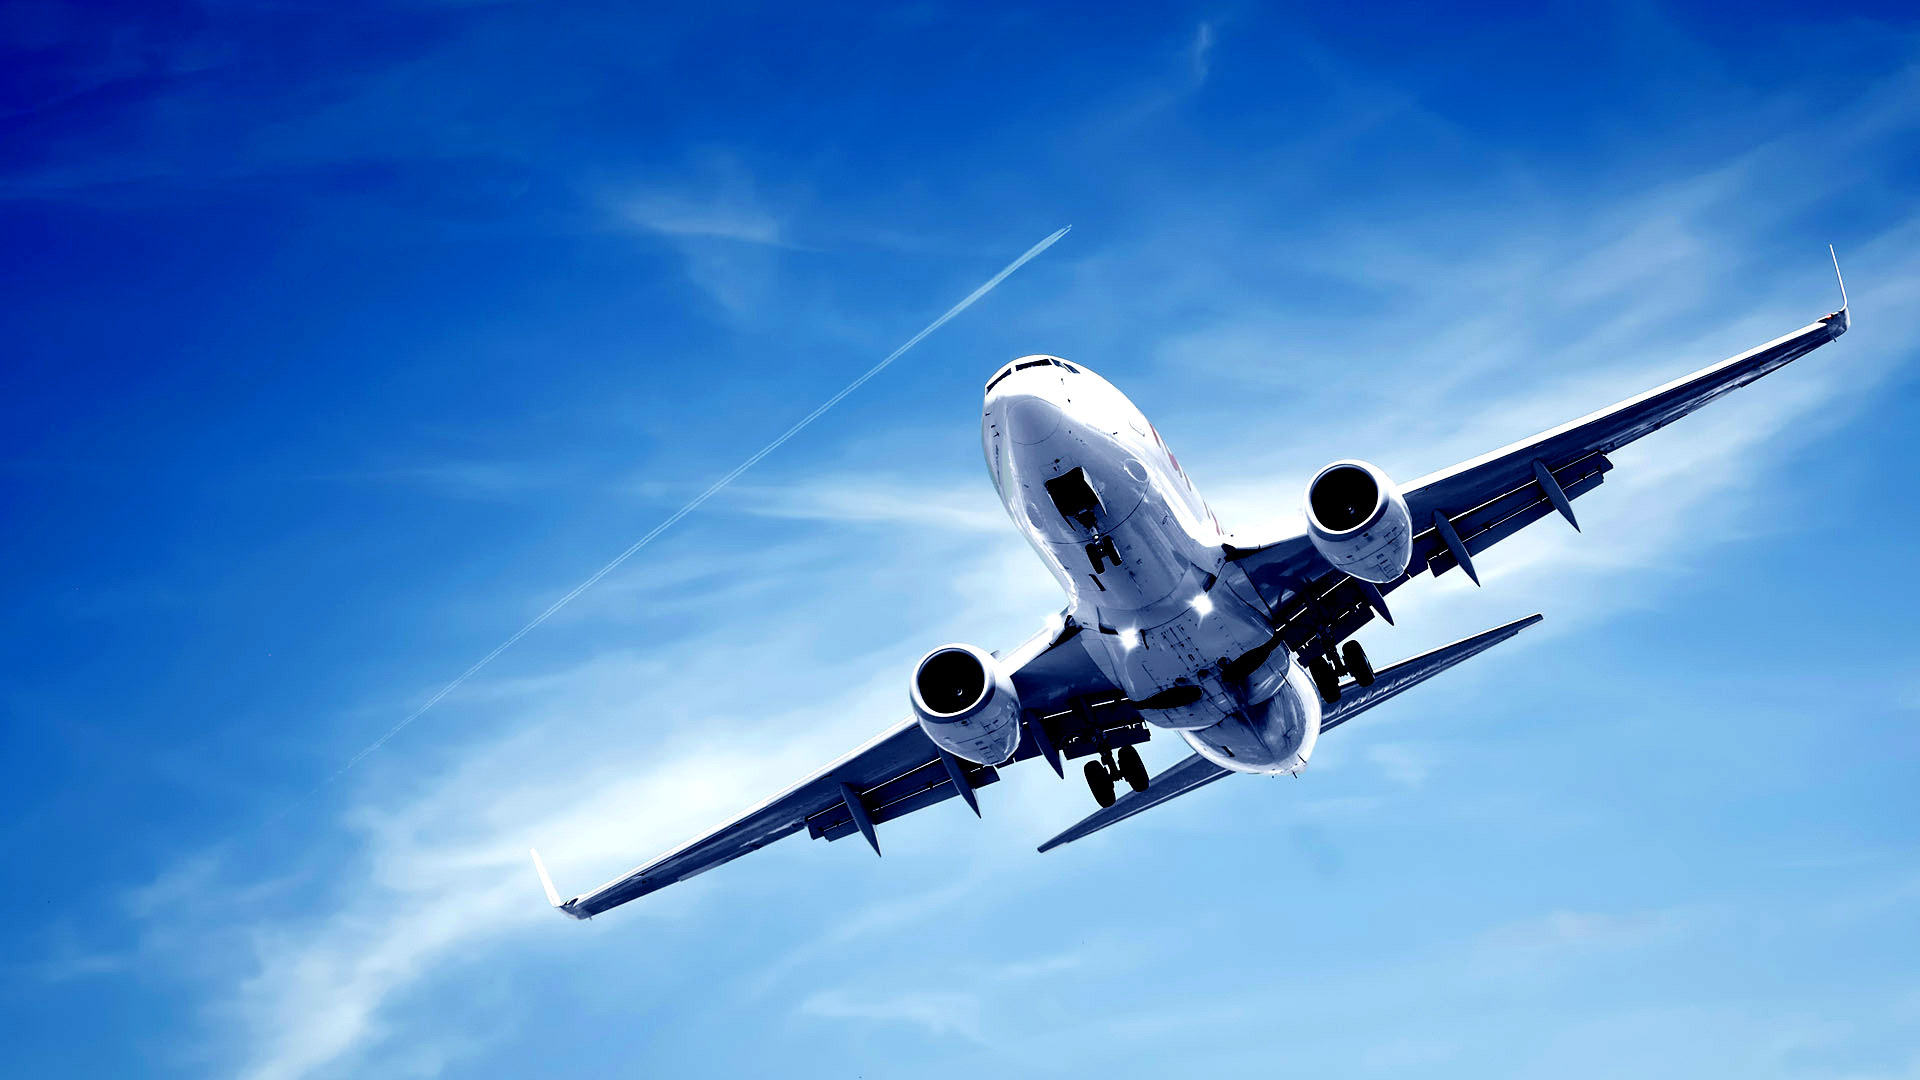 Aeroplane2998614683 - Aeroplane - Valkyrie, Aeroplane